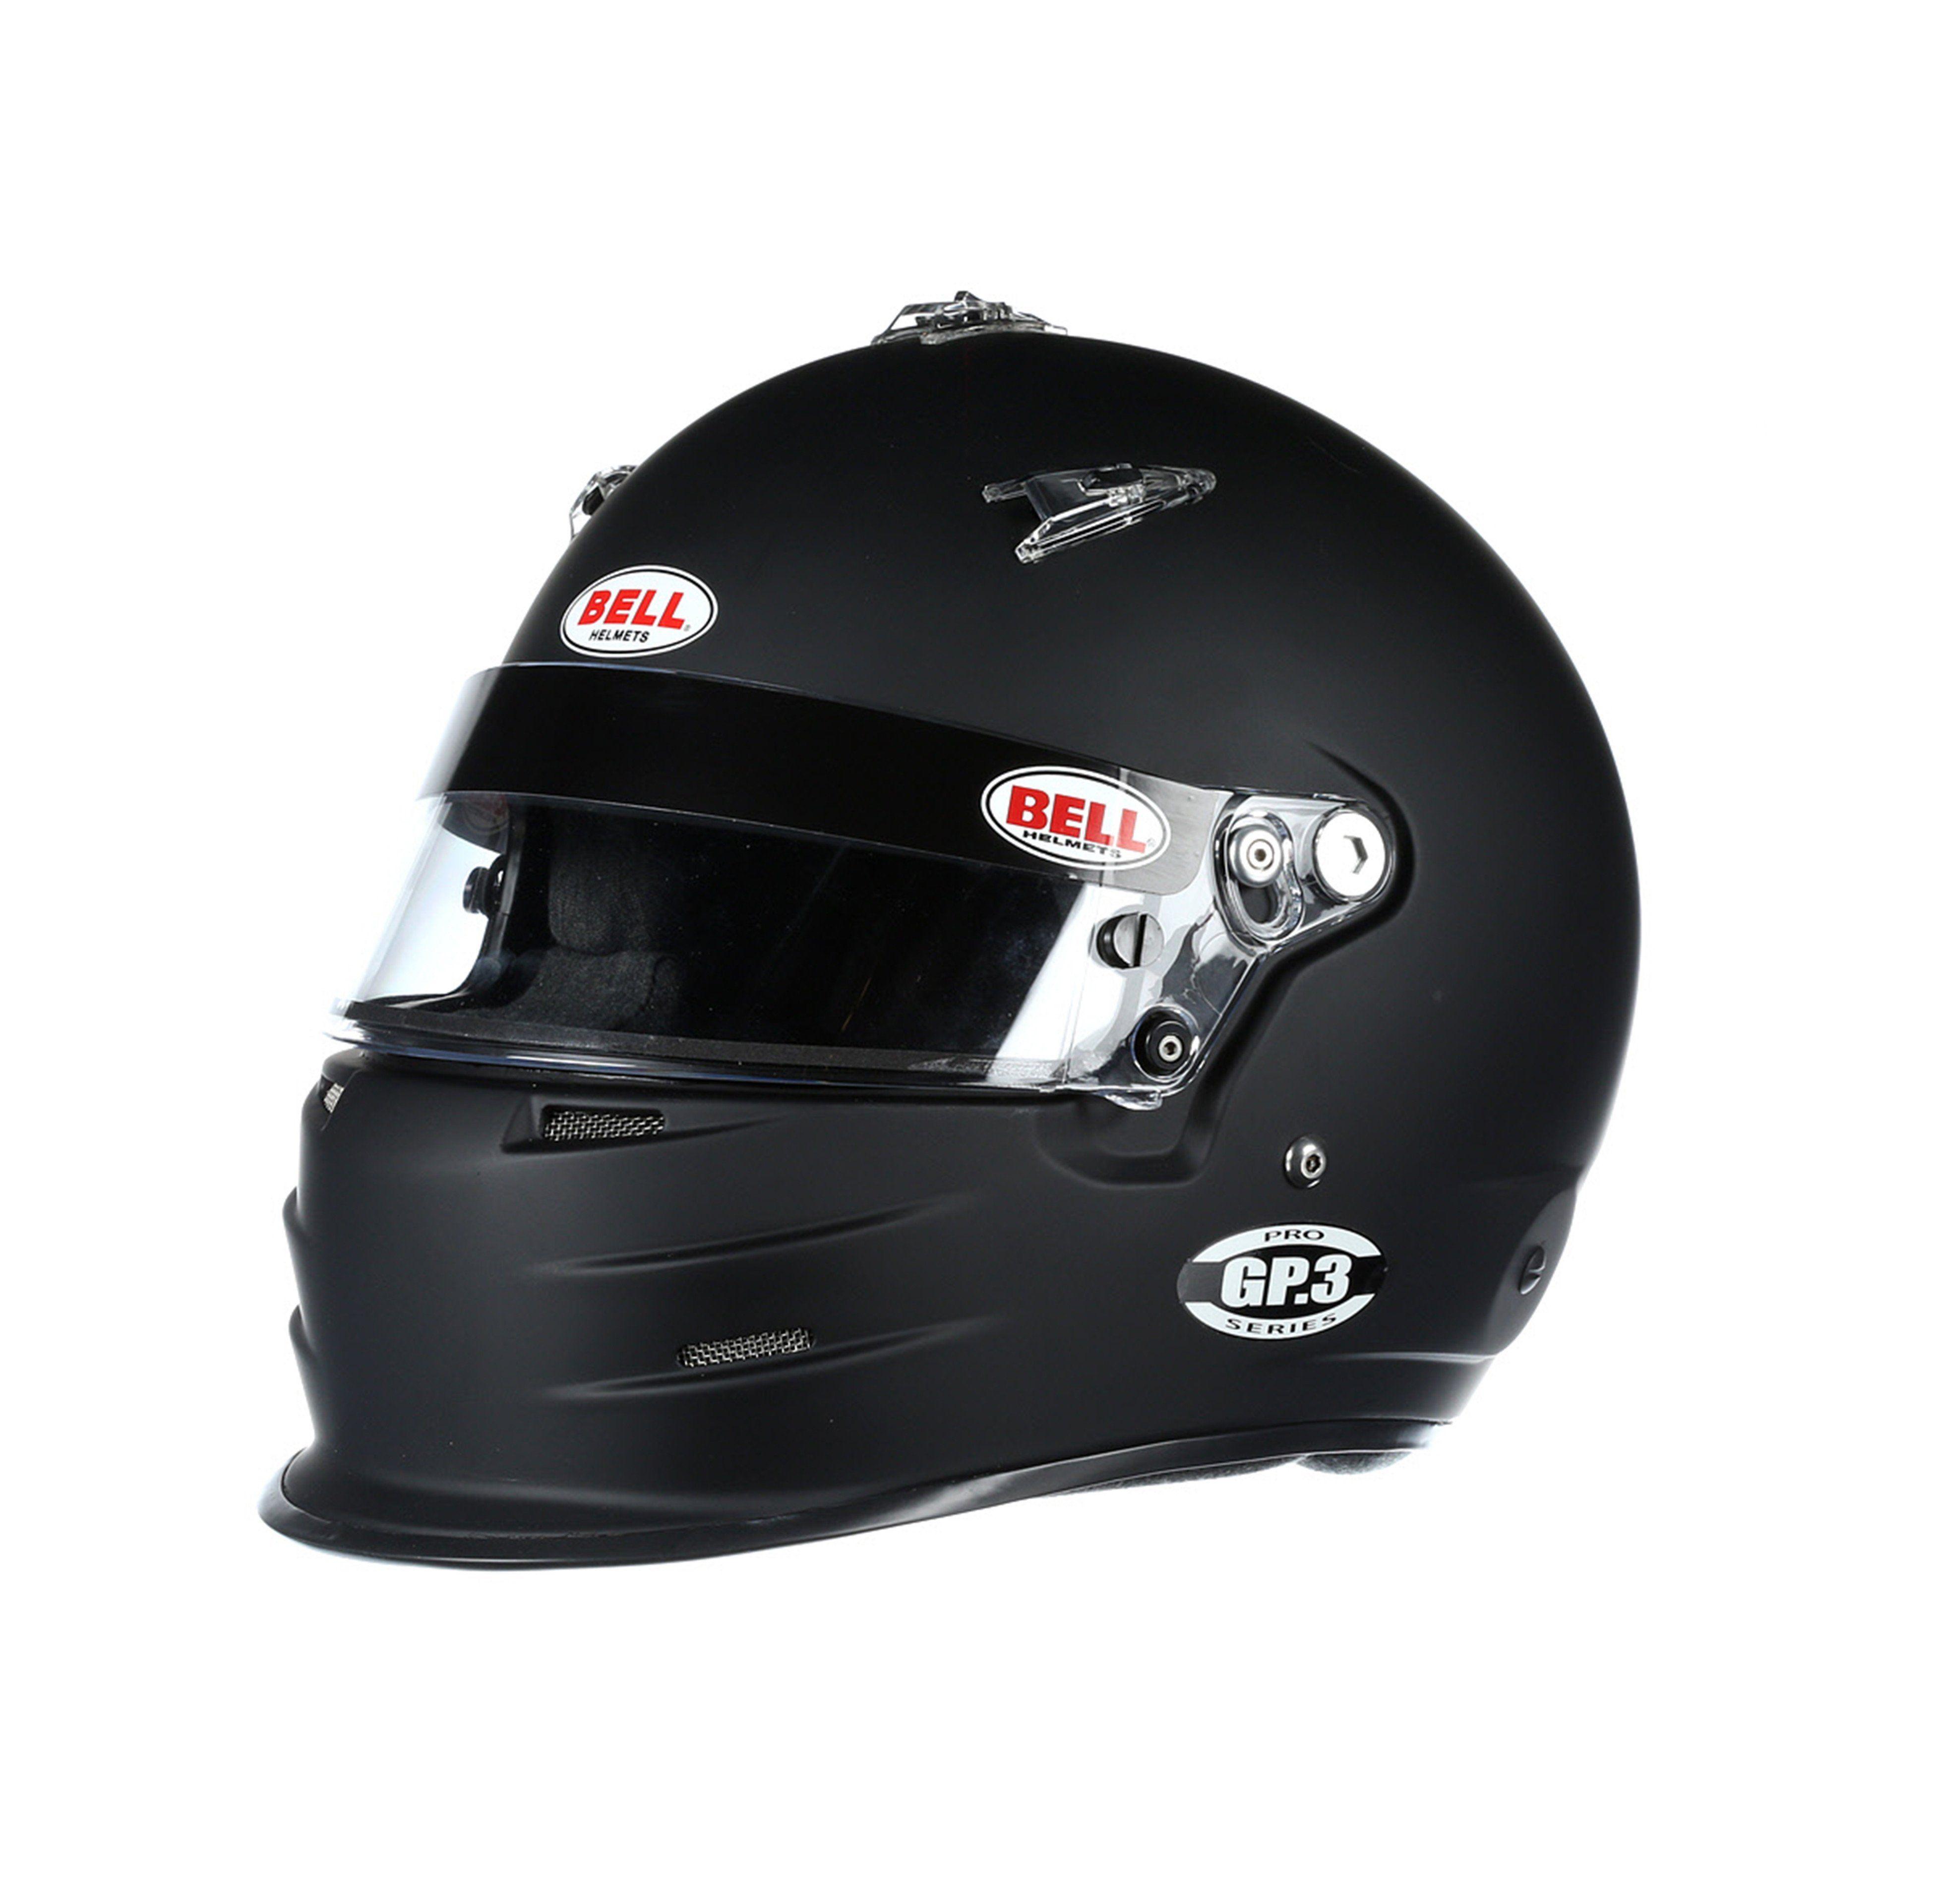 7c32cb72 Auto Racing Helmets >> Bell Gp3 Helmet Helments Racing Helmets Helmet Race  Cars